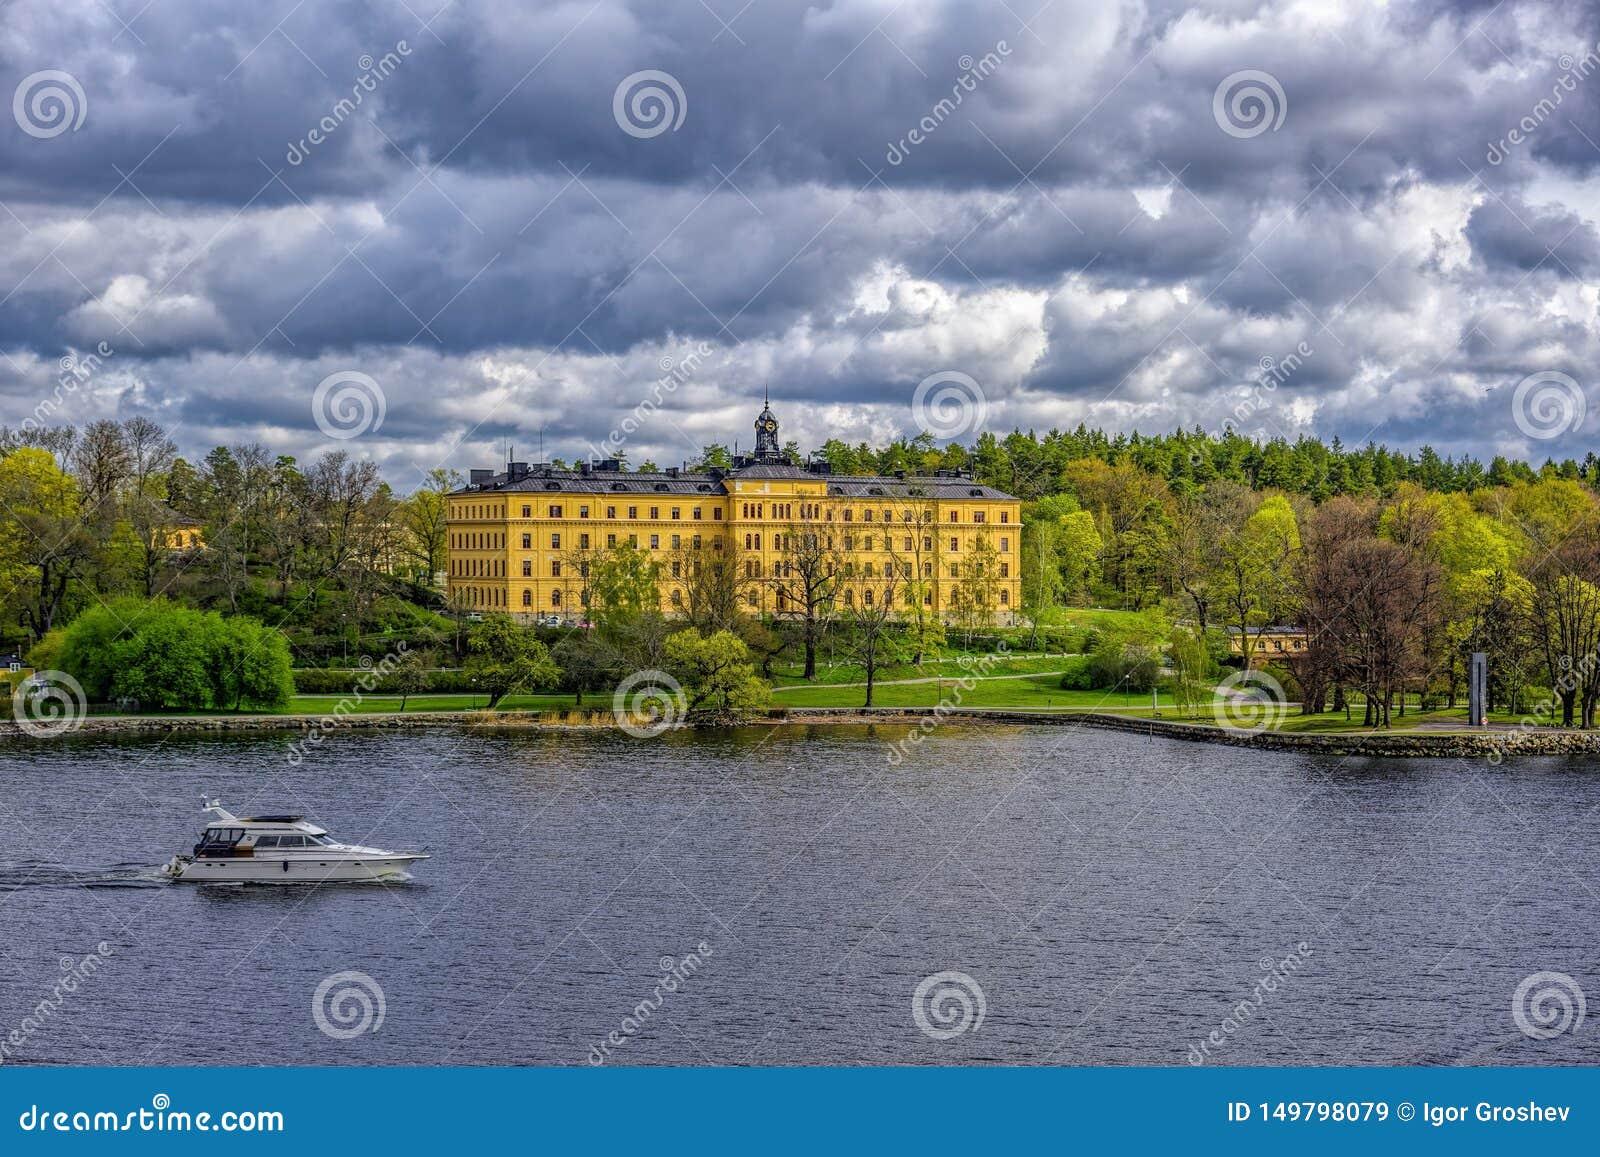 Manilla campus, school building, Stockholm, Sweden at sunny spring morning